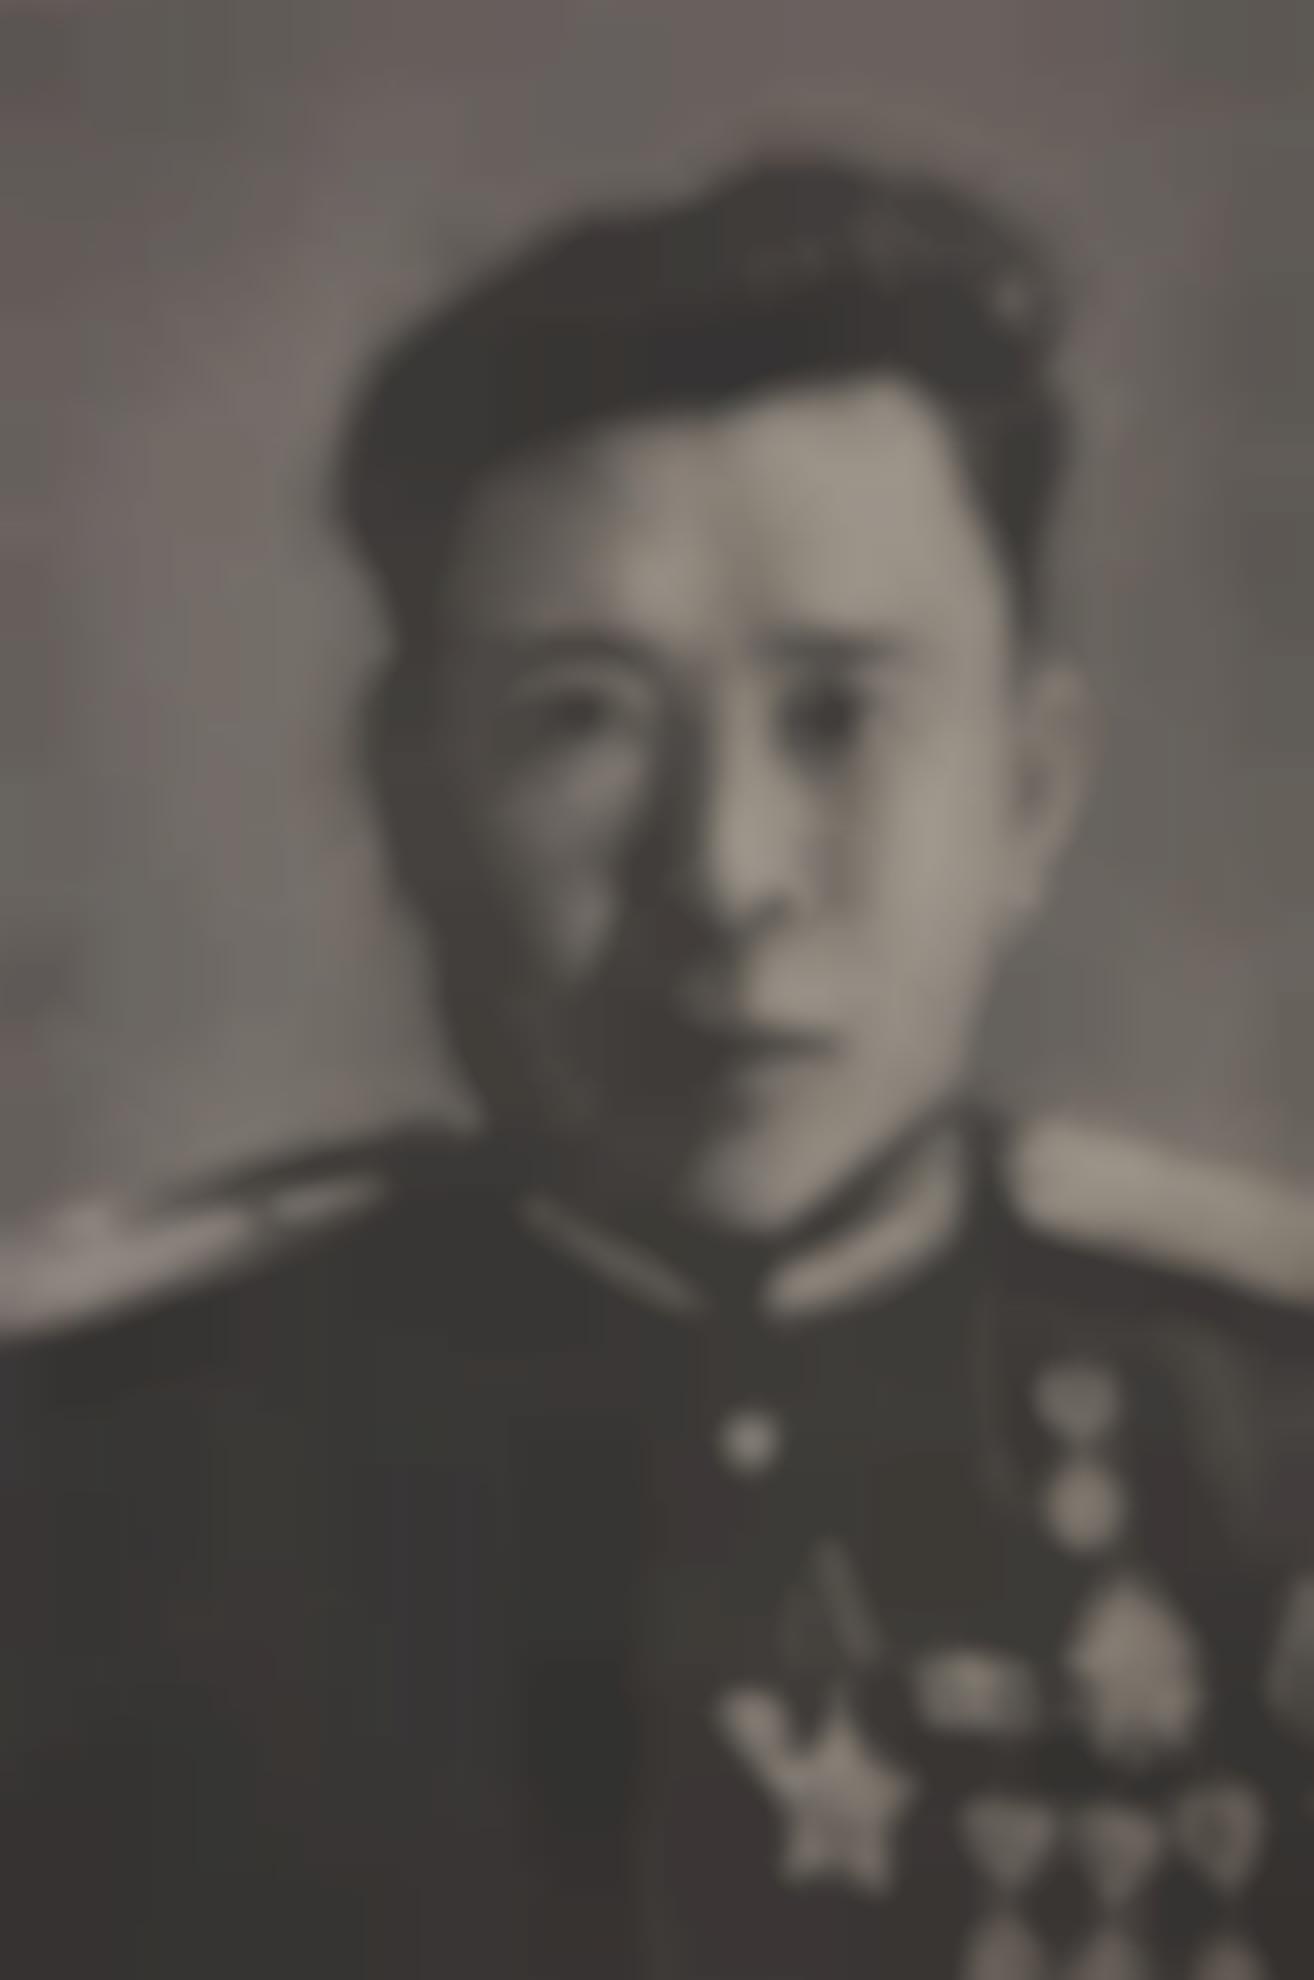 Zhang Huan-Medal-2008